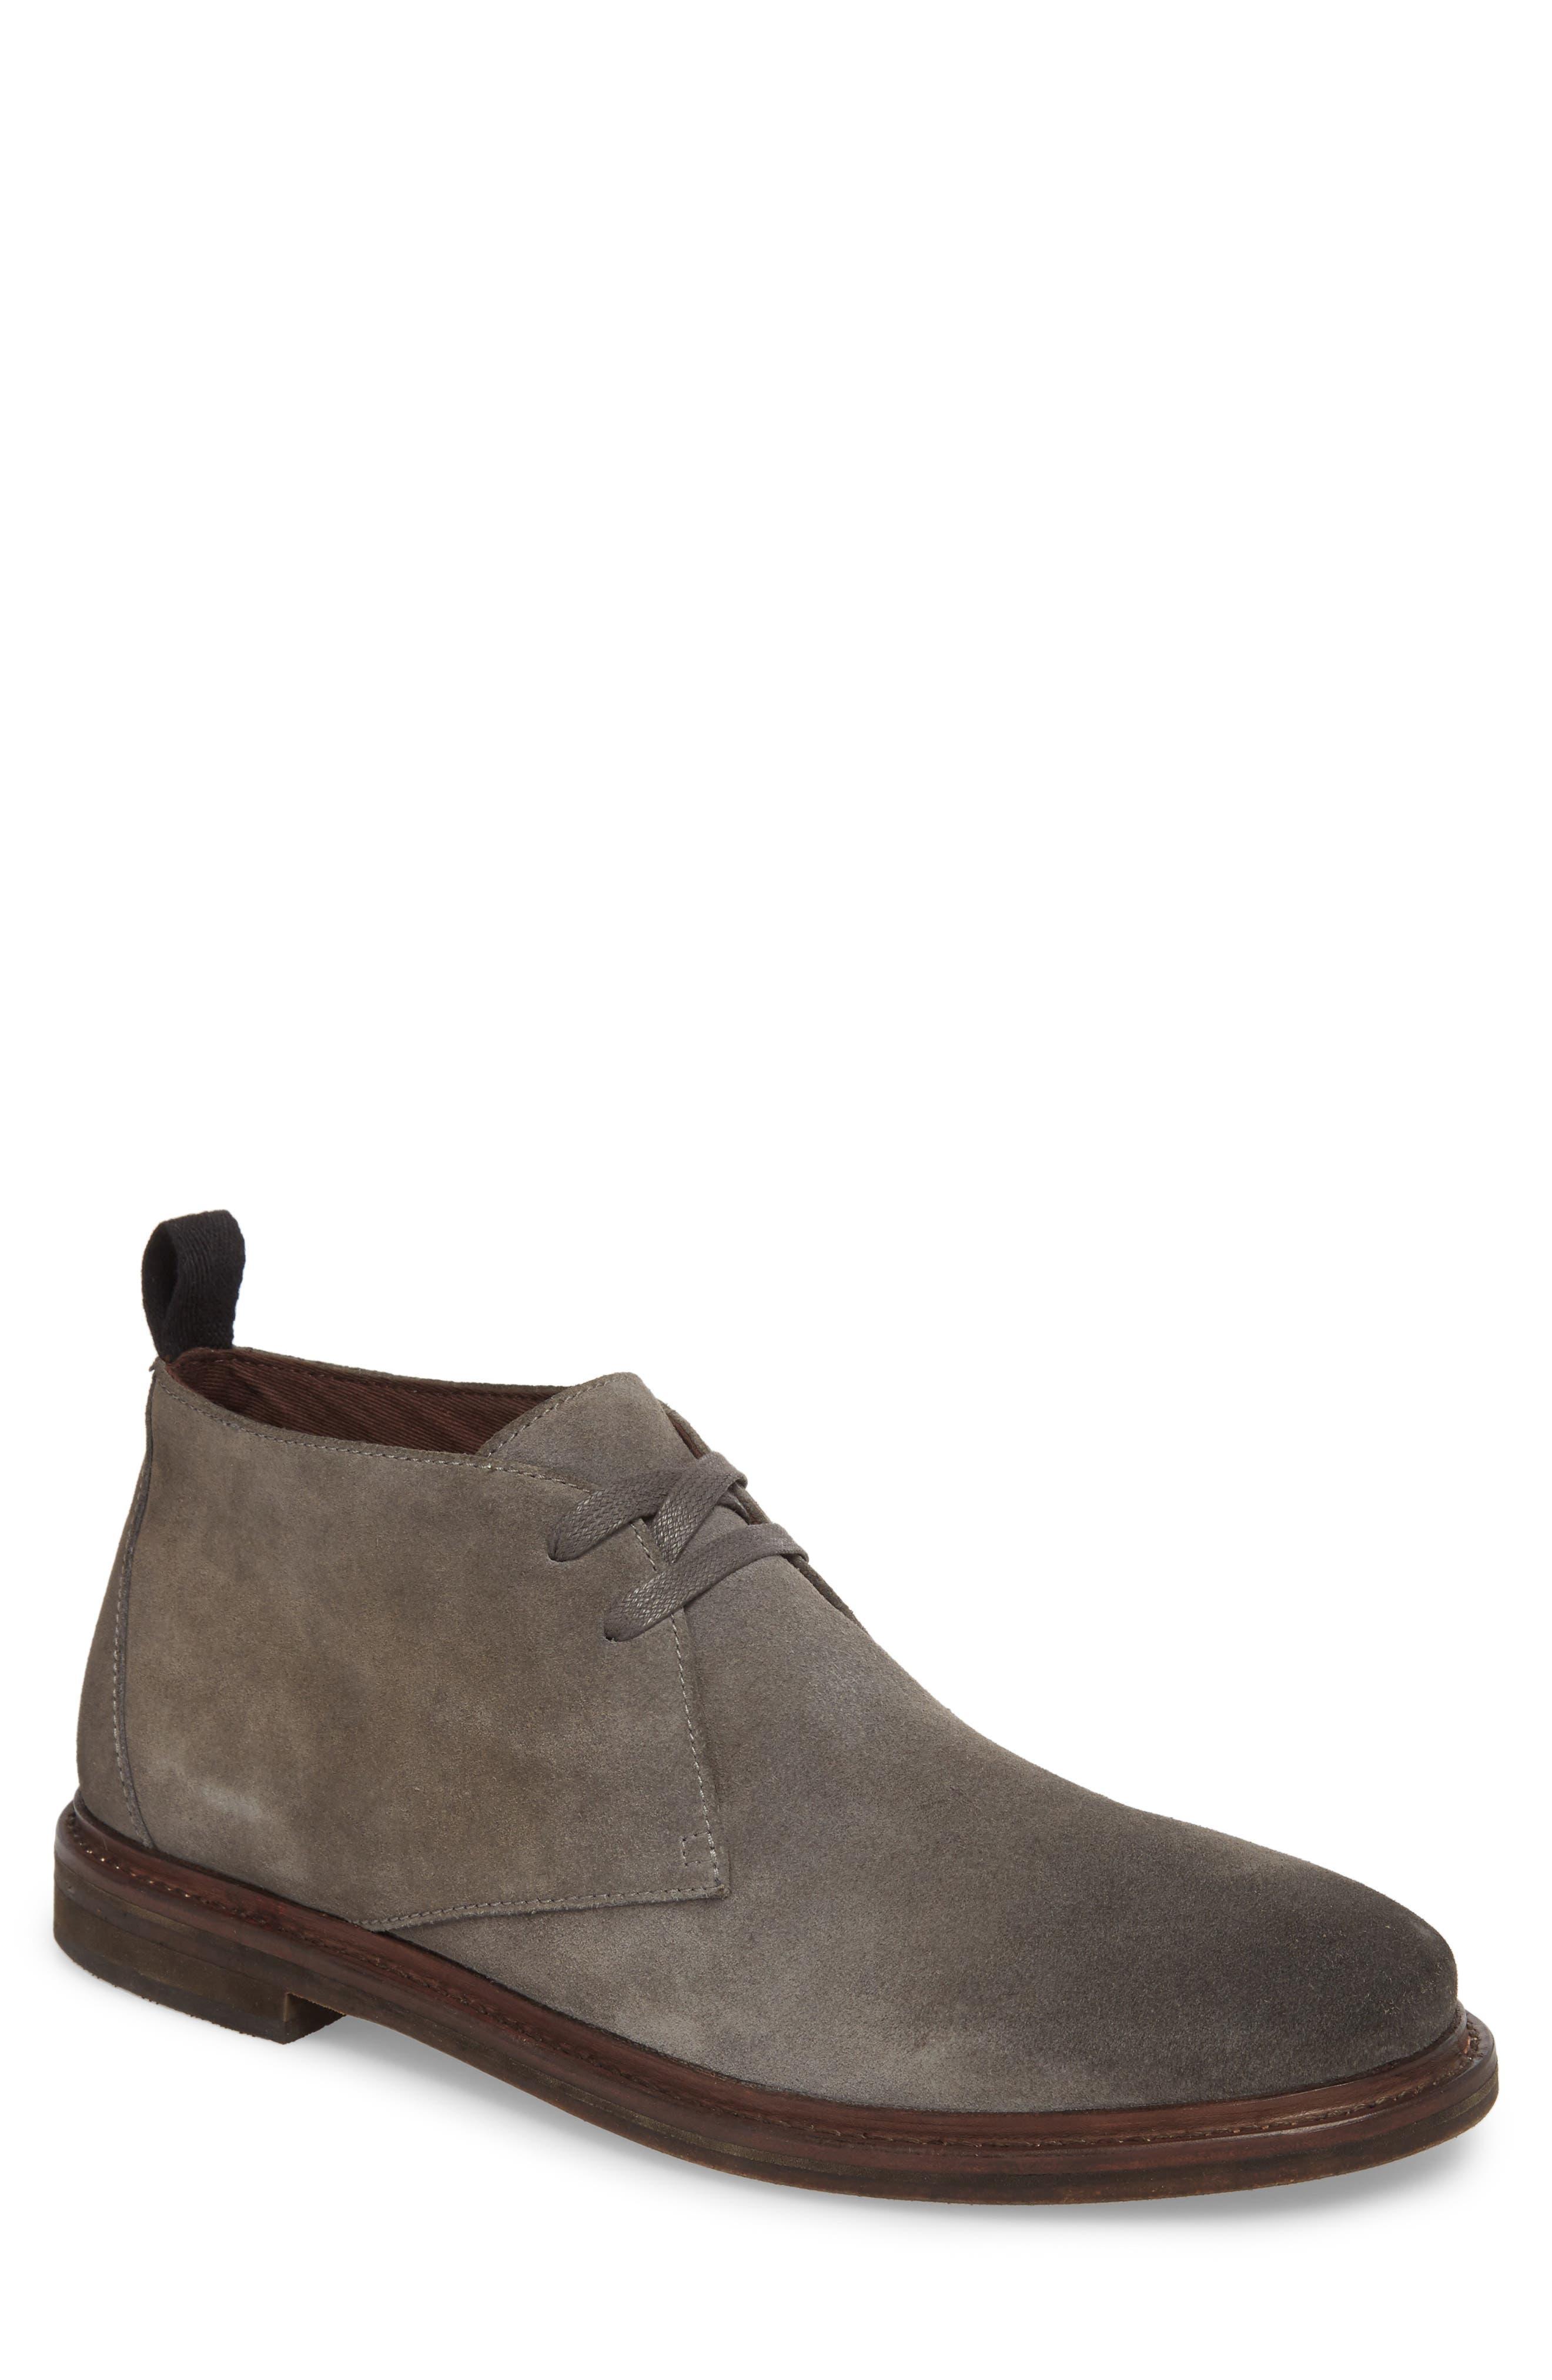 Plain Toe Chukka Boot, Main, color, 023